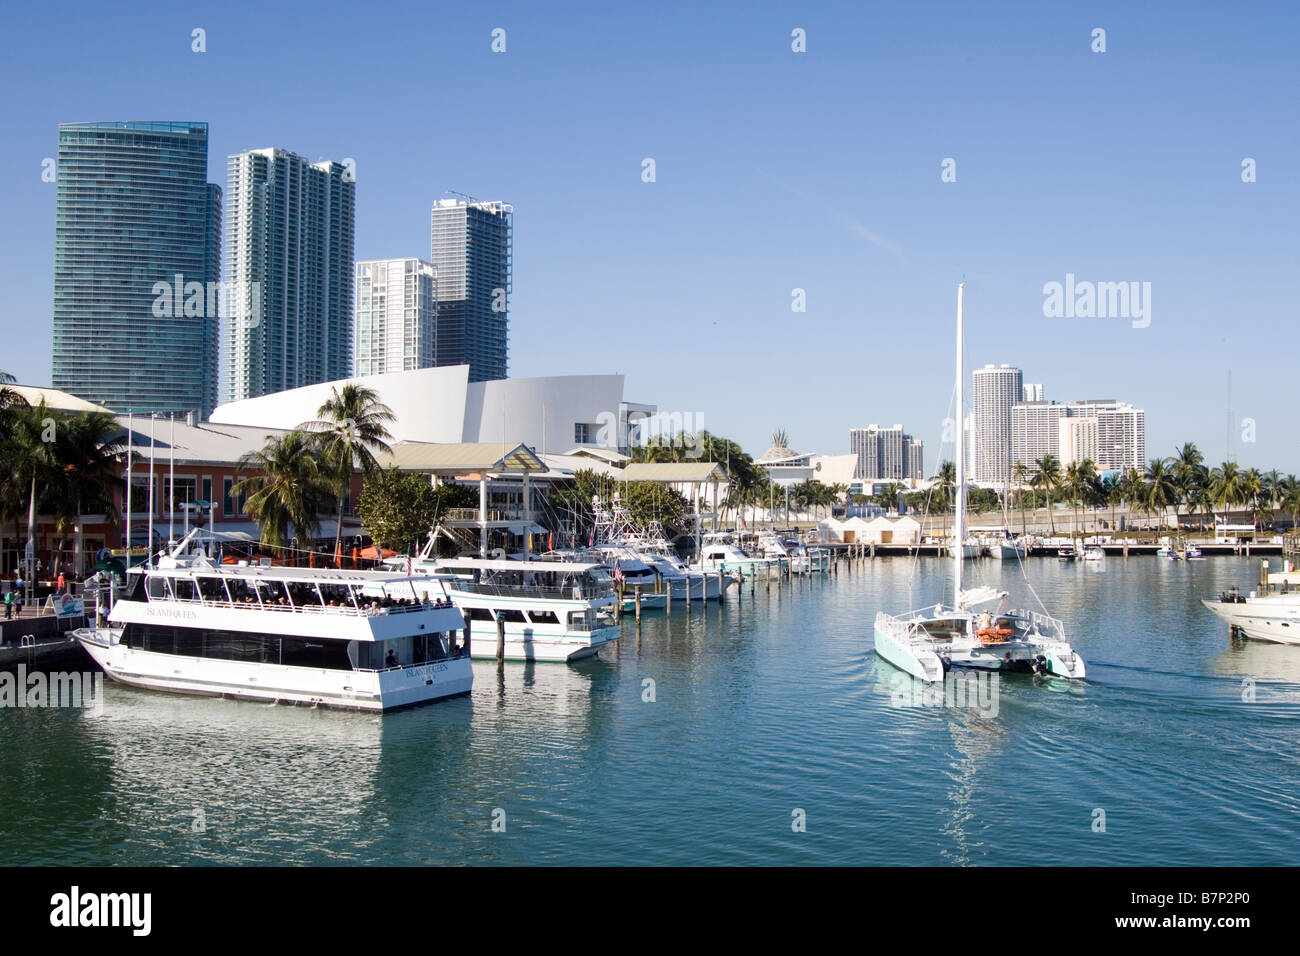 Downtown Miami Bayside Marketplace Imagen De Stock